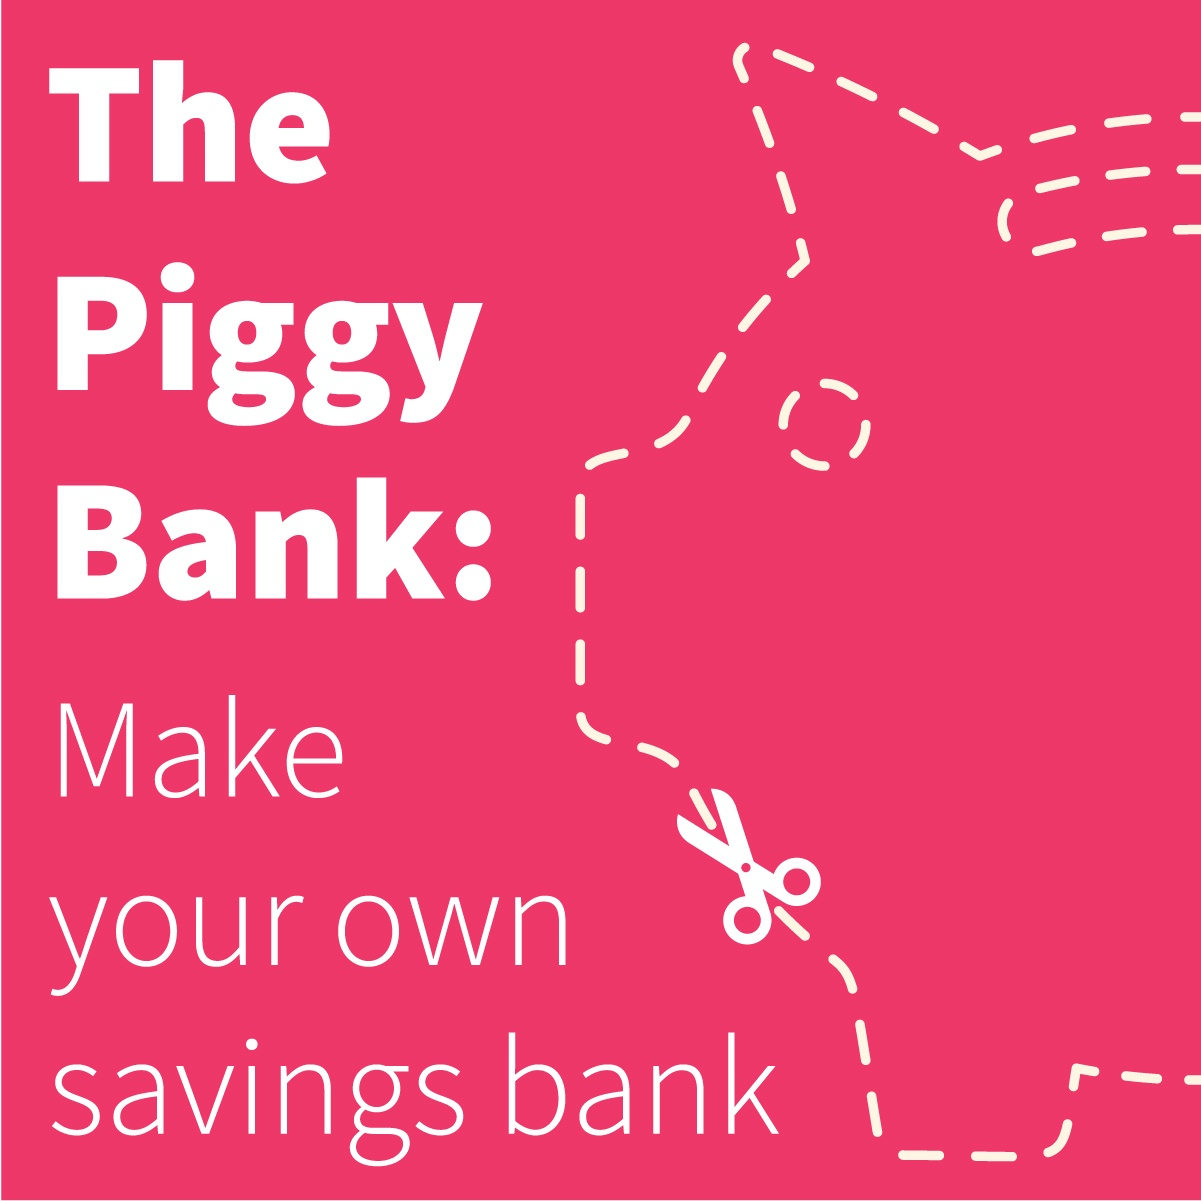 Piggy bank make your own savings bank blog-01.jpg